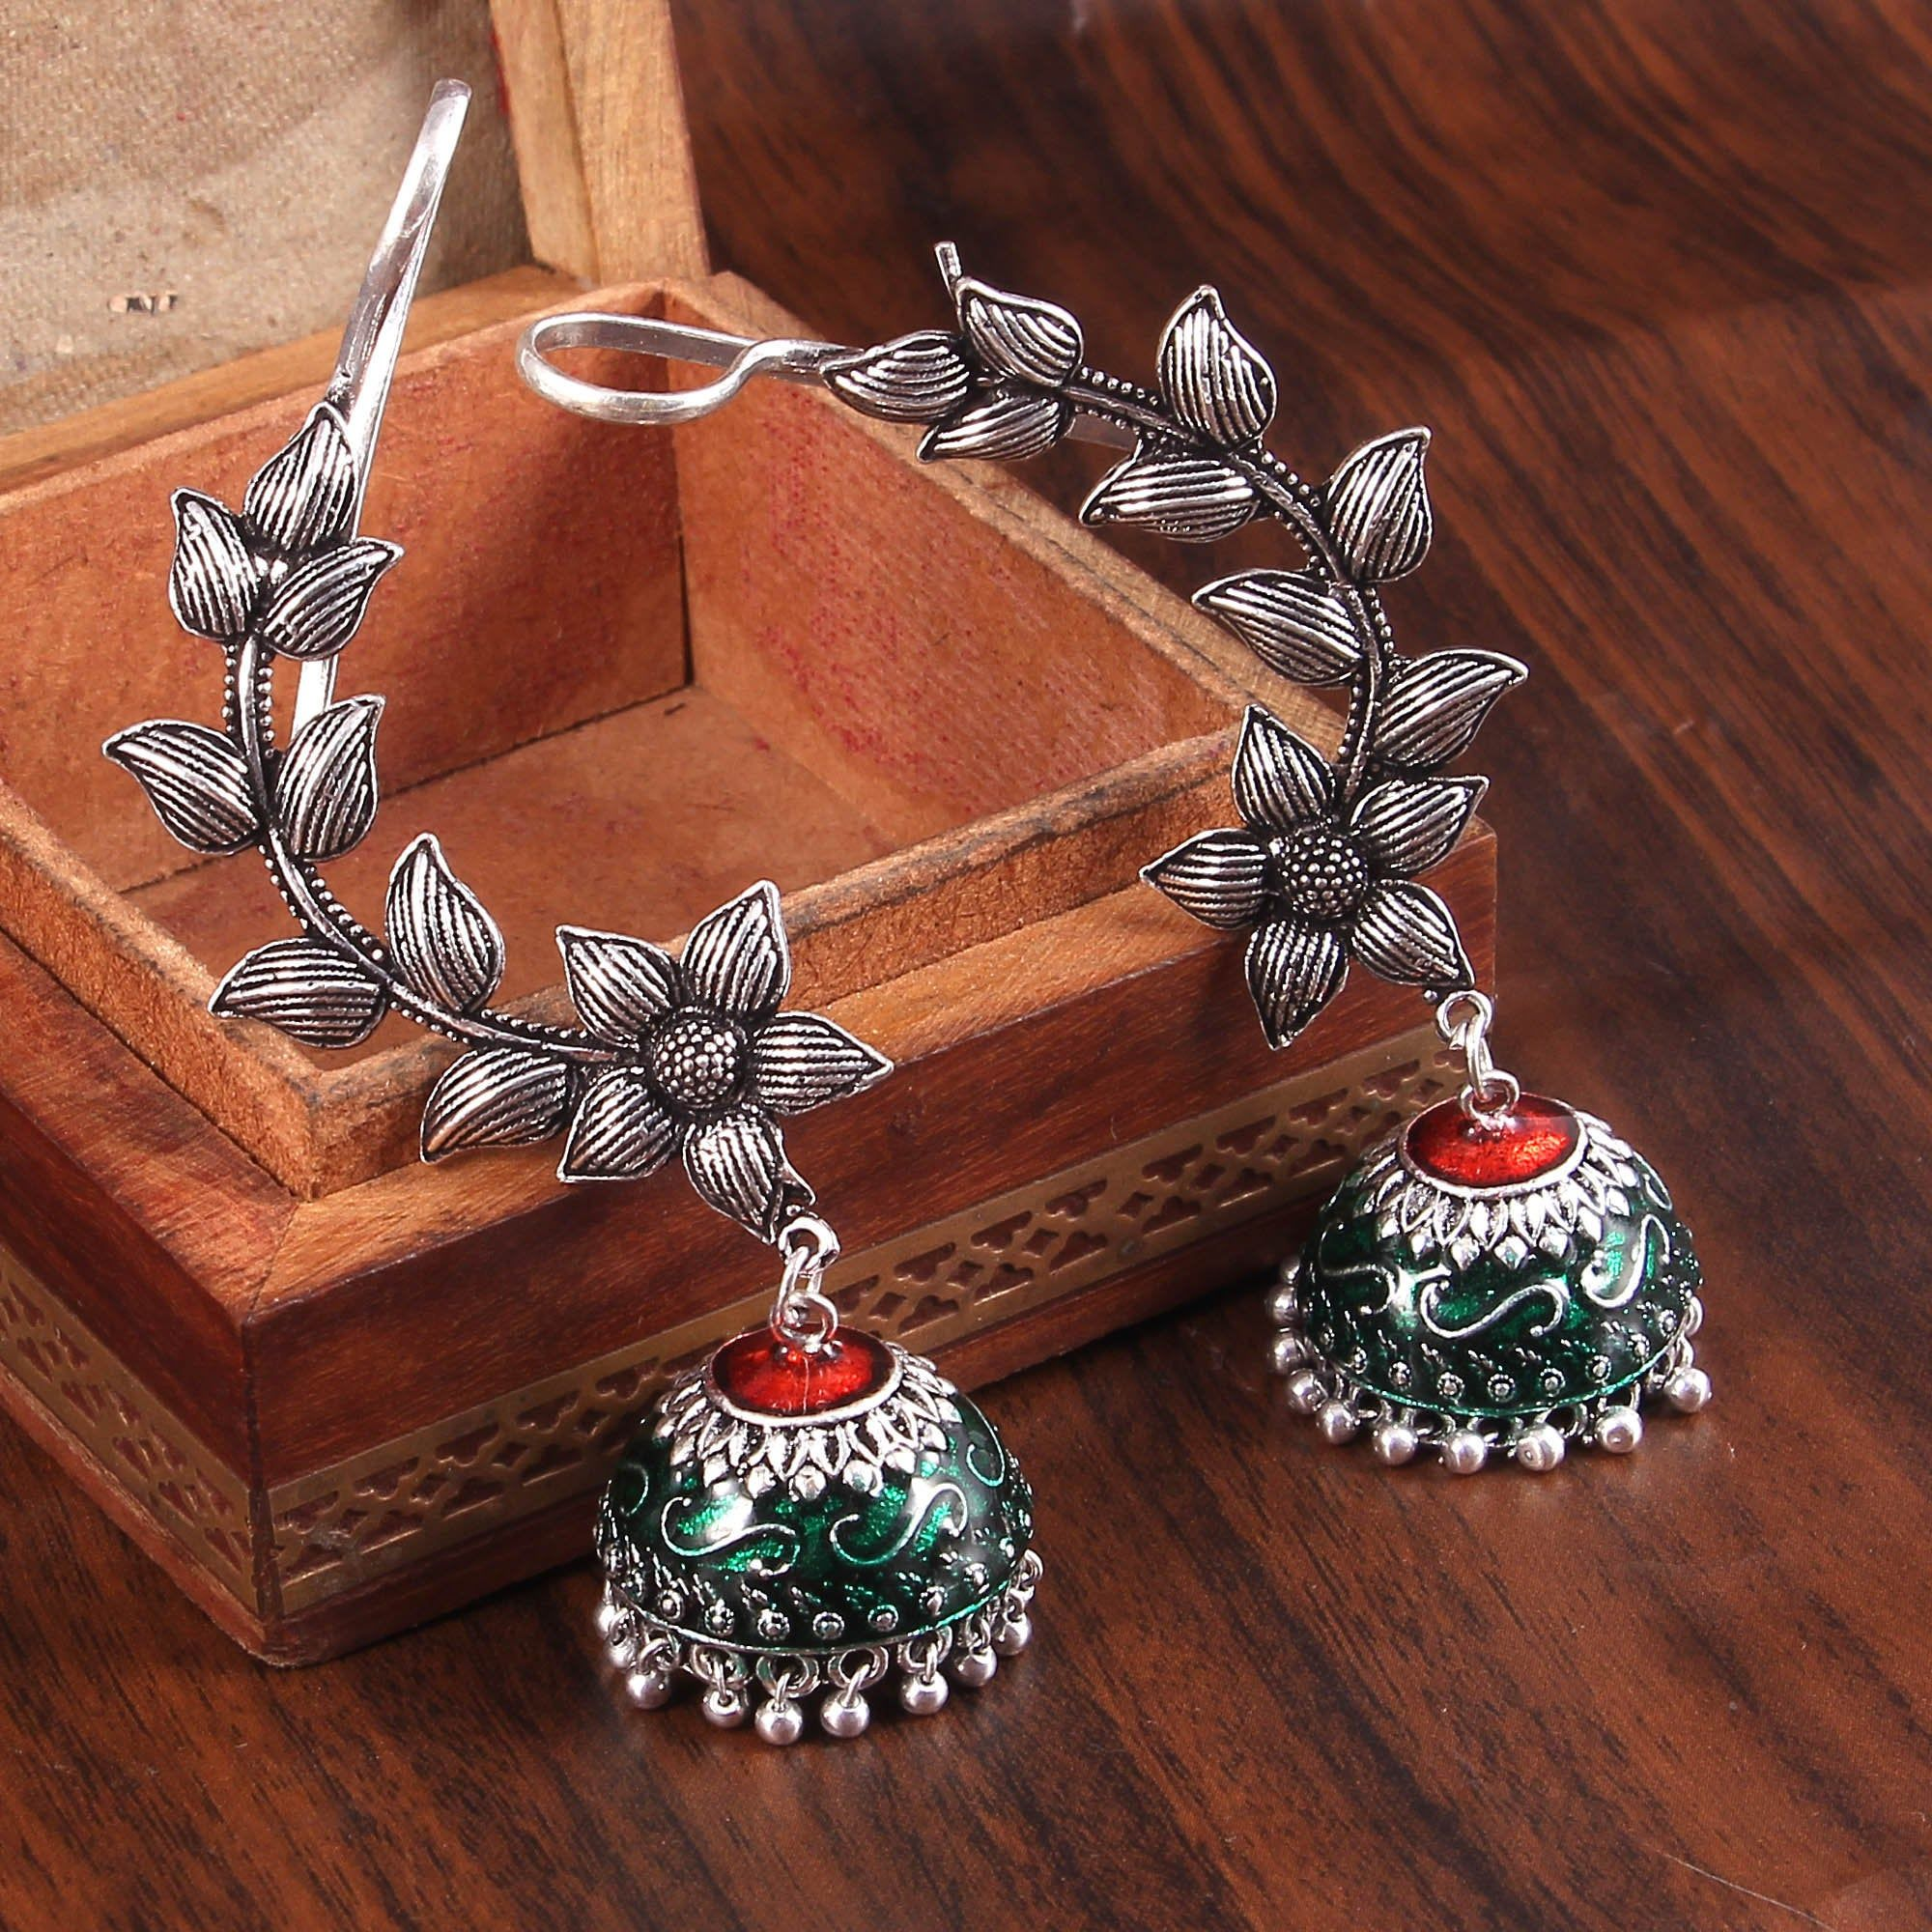 Oxidized Silver Plated Meenakari Ear-cuff Jhumka Jhumki Earrings Jewelry women